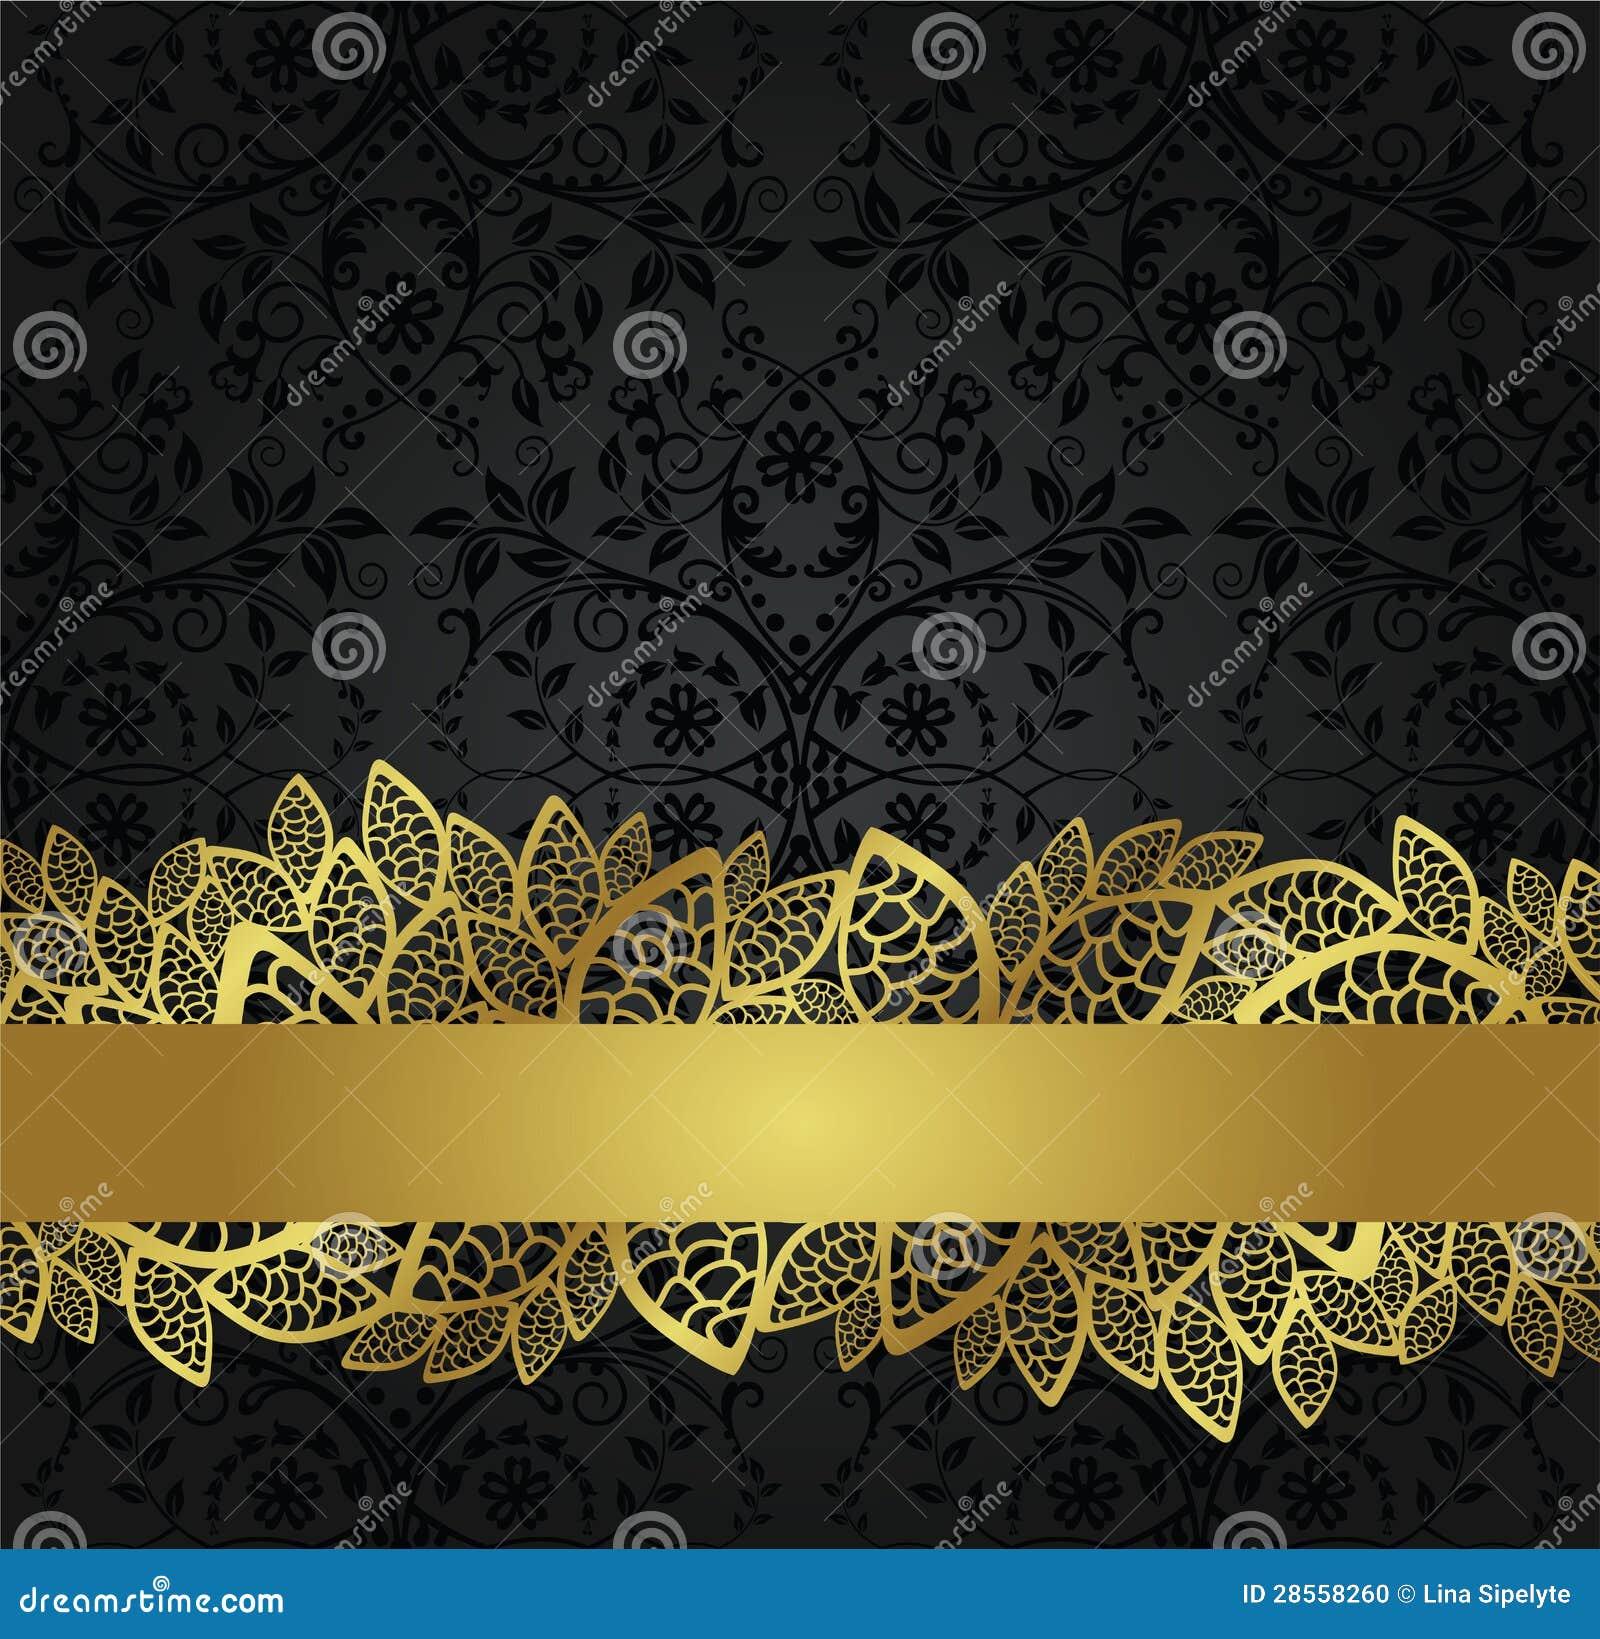 Ornament Party Invitations is beautiful invitations ideas